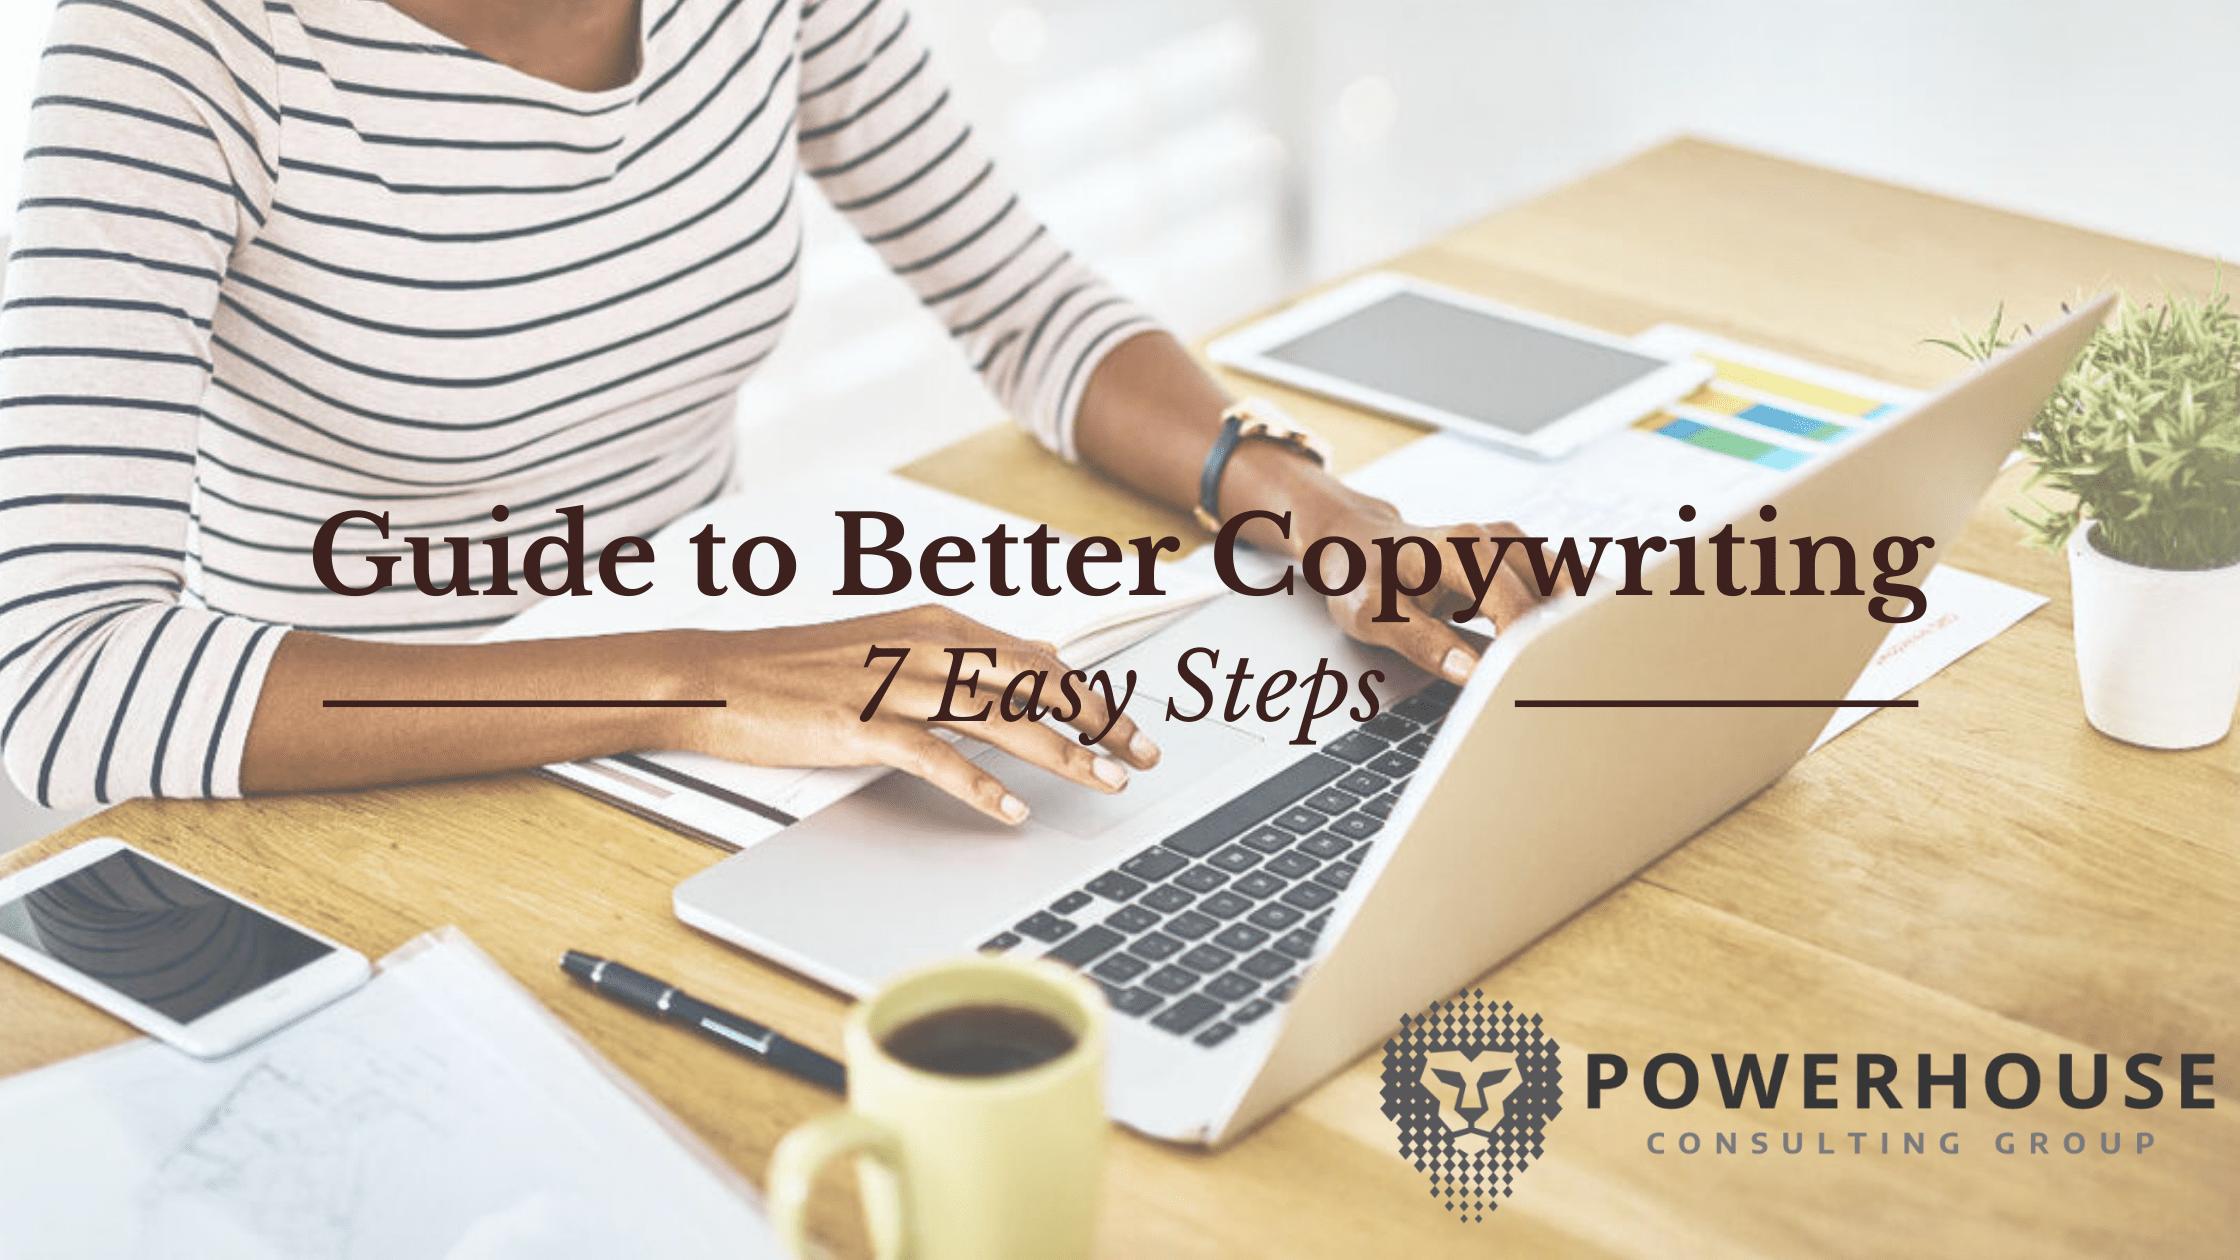 7 Easy Steps Guide to Better Copywriting